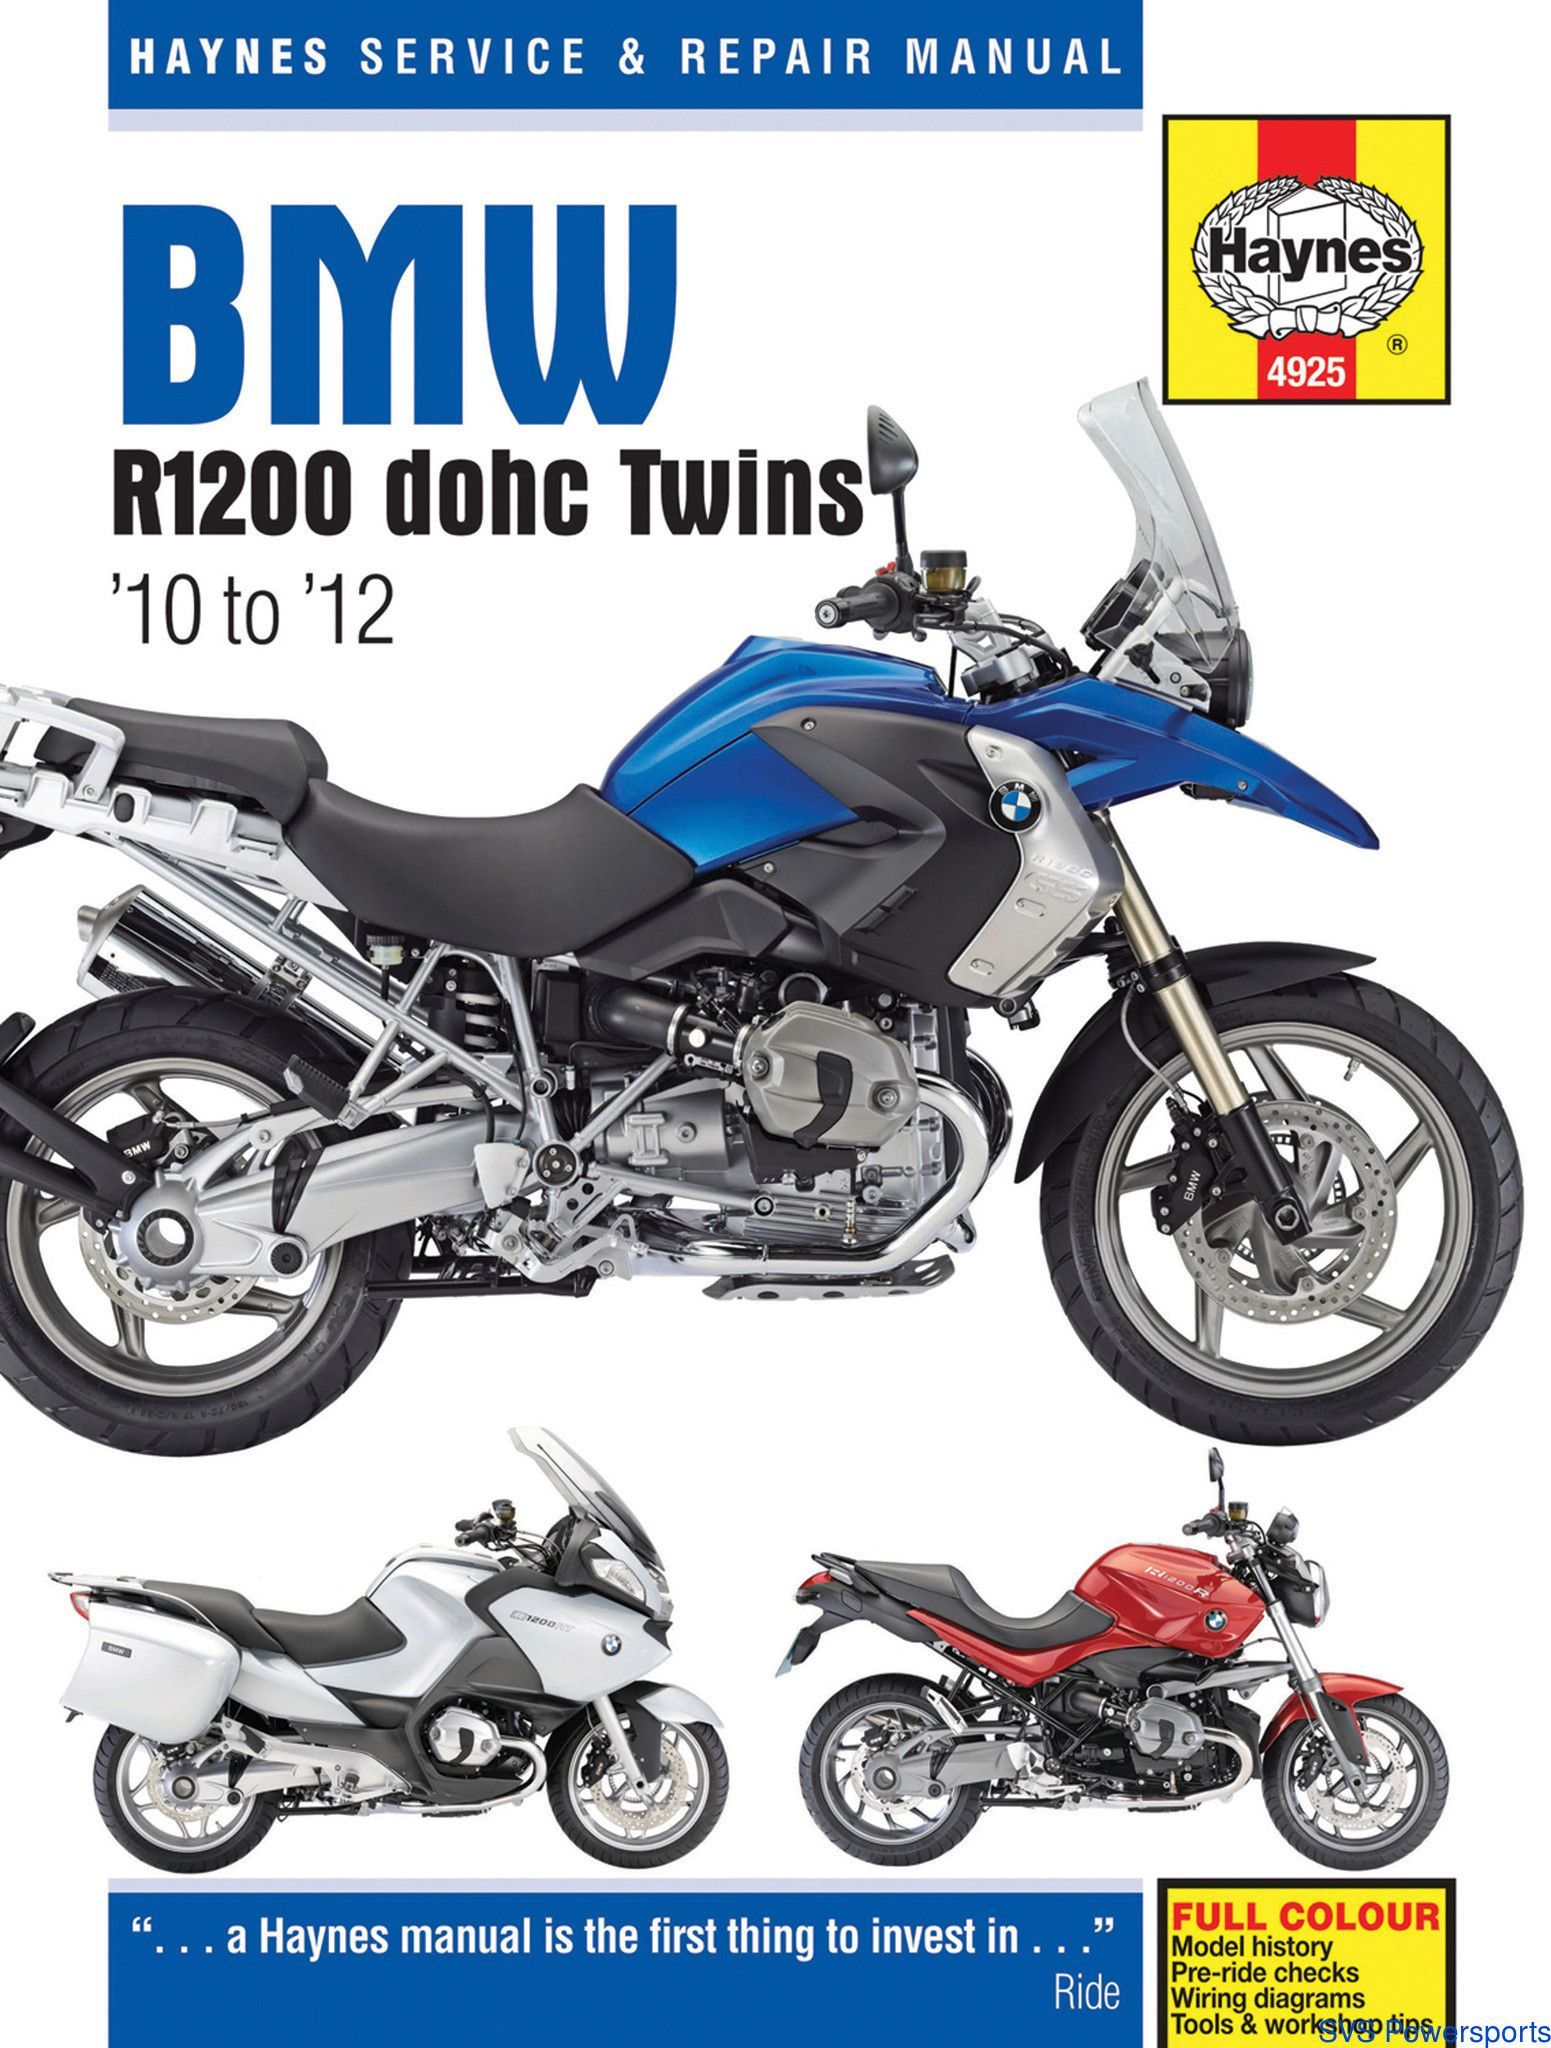 Haynes M4925 Repair Manual for 2010-12 BMW R1200 dohc Twins